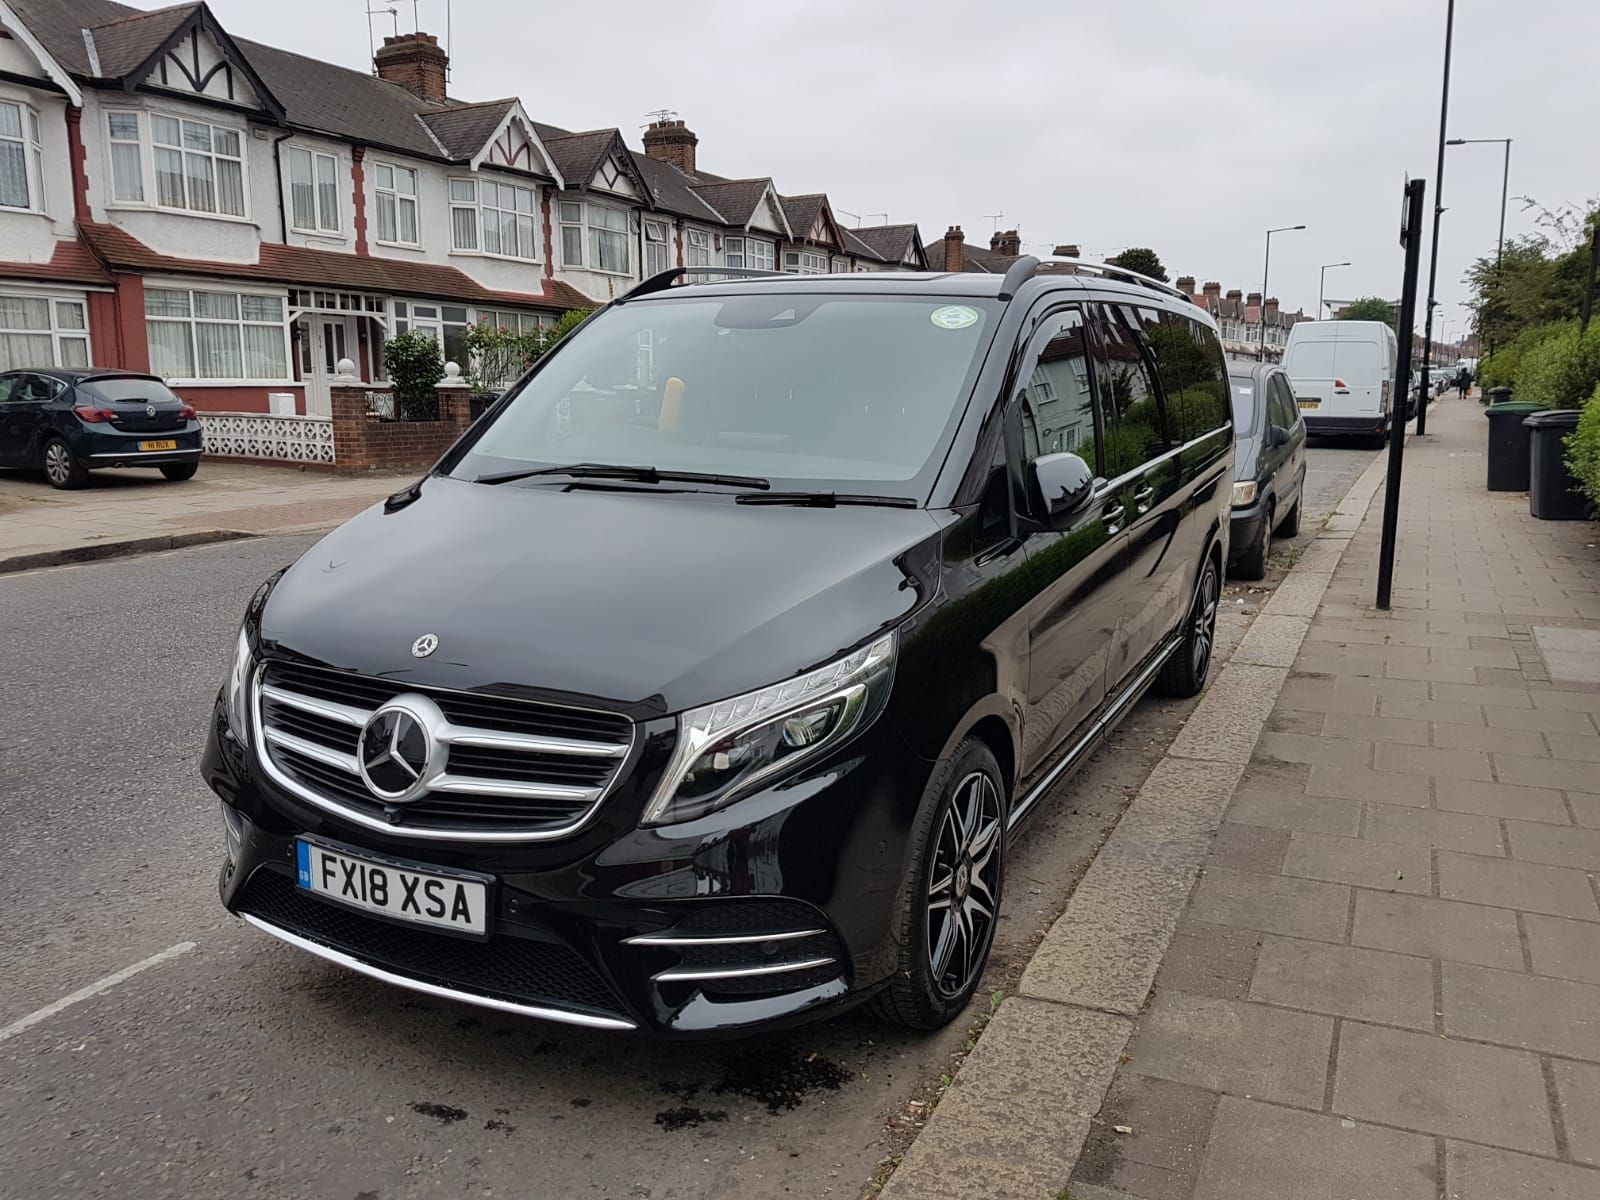 Hcd chauffeur drive has been providing the luxury london